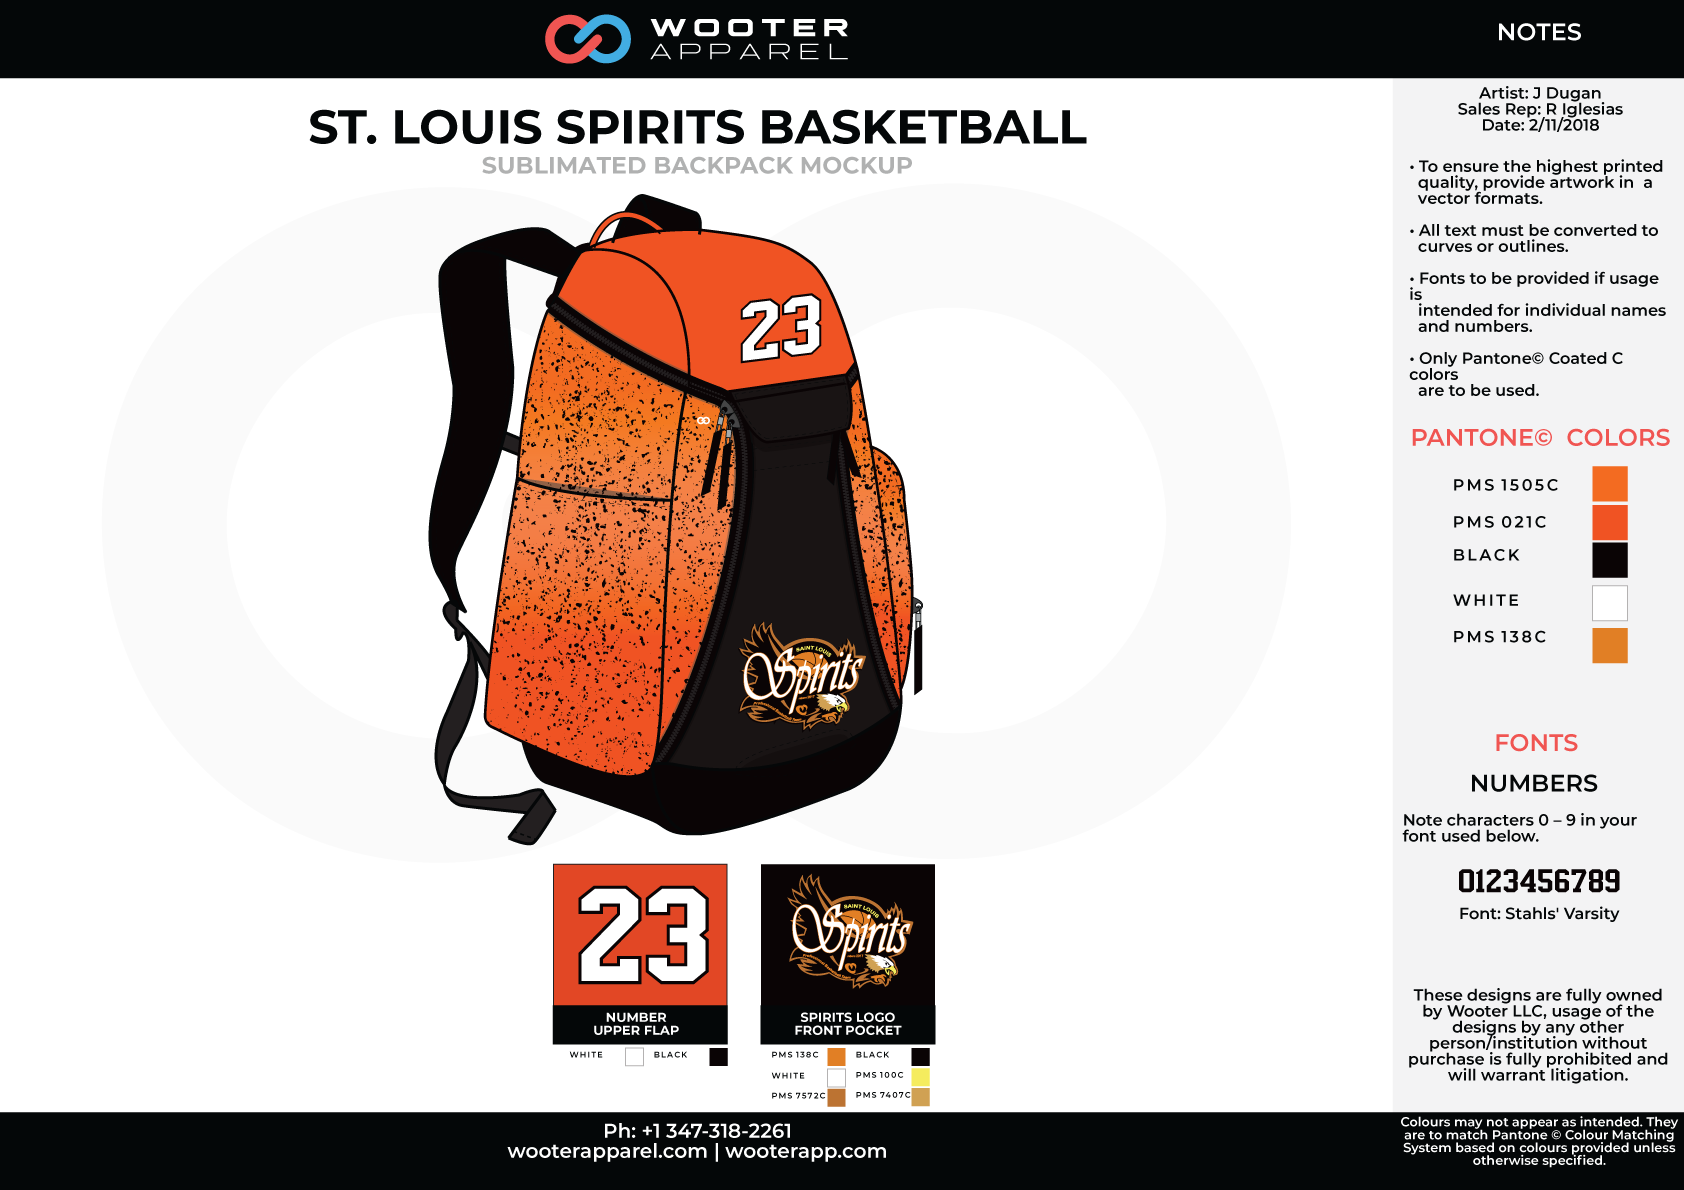 ST. LOUIS SPIRITS Orange Black White Sublimated Basketball Backpack Mock Up